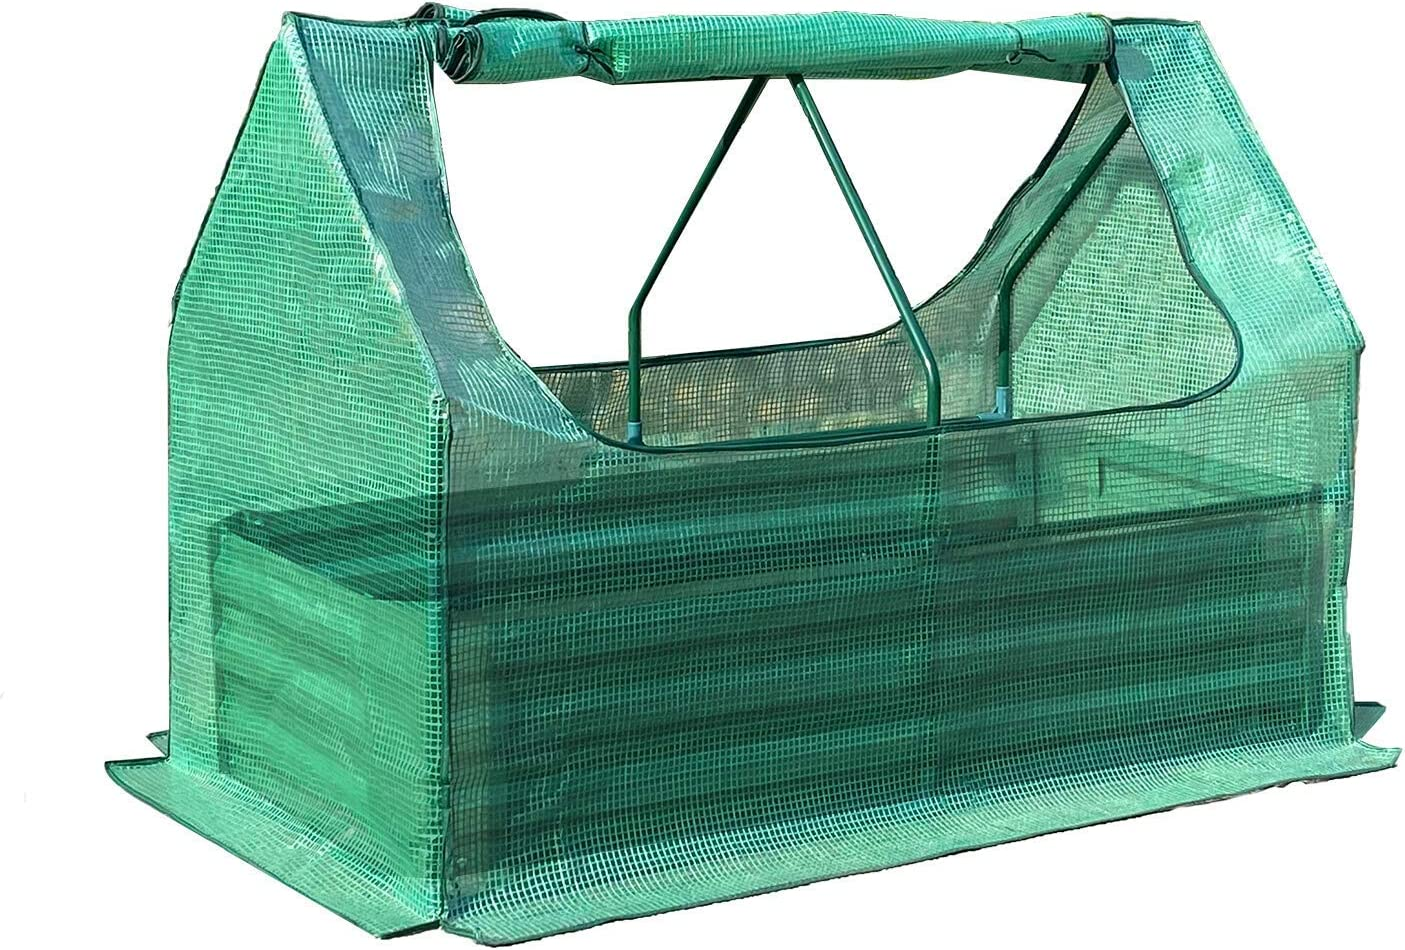 Aoodor 4 ft. x 2 ft. x 3ft. Raised Garden Bed Galvanized Steel Metal Planter w/ Mini Greenhouse Water Resistant UV Protected - Two Zipper Doors